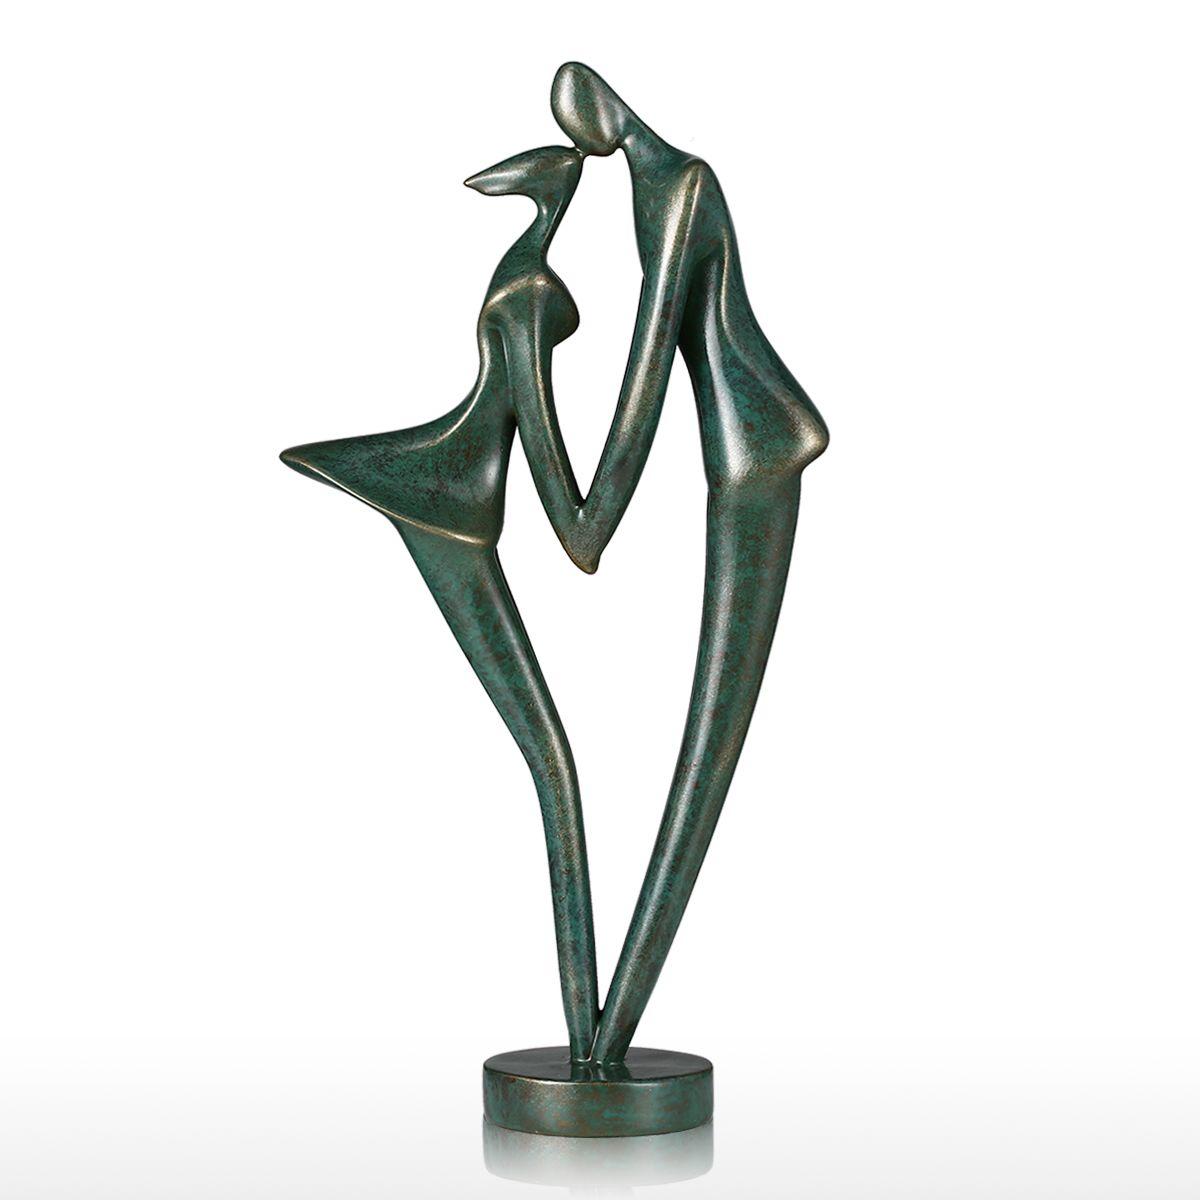 best and cheap bronze new couple 1 tomfeel fiberglass sculpture home decoration original design. Black Bedroom Furniture Sets. Home Design Ideas